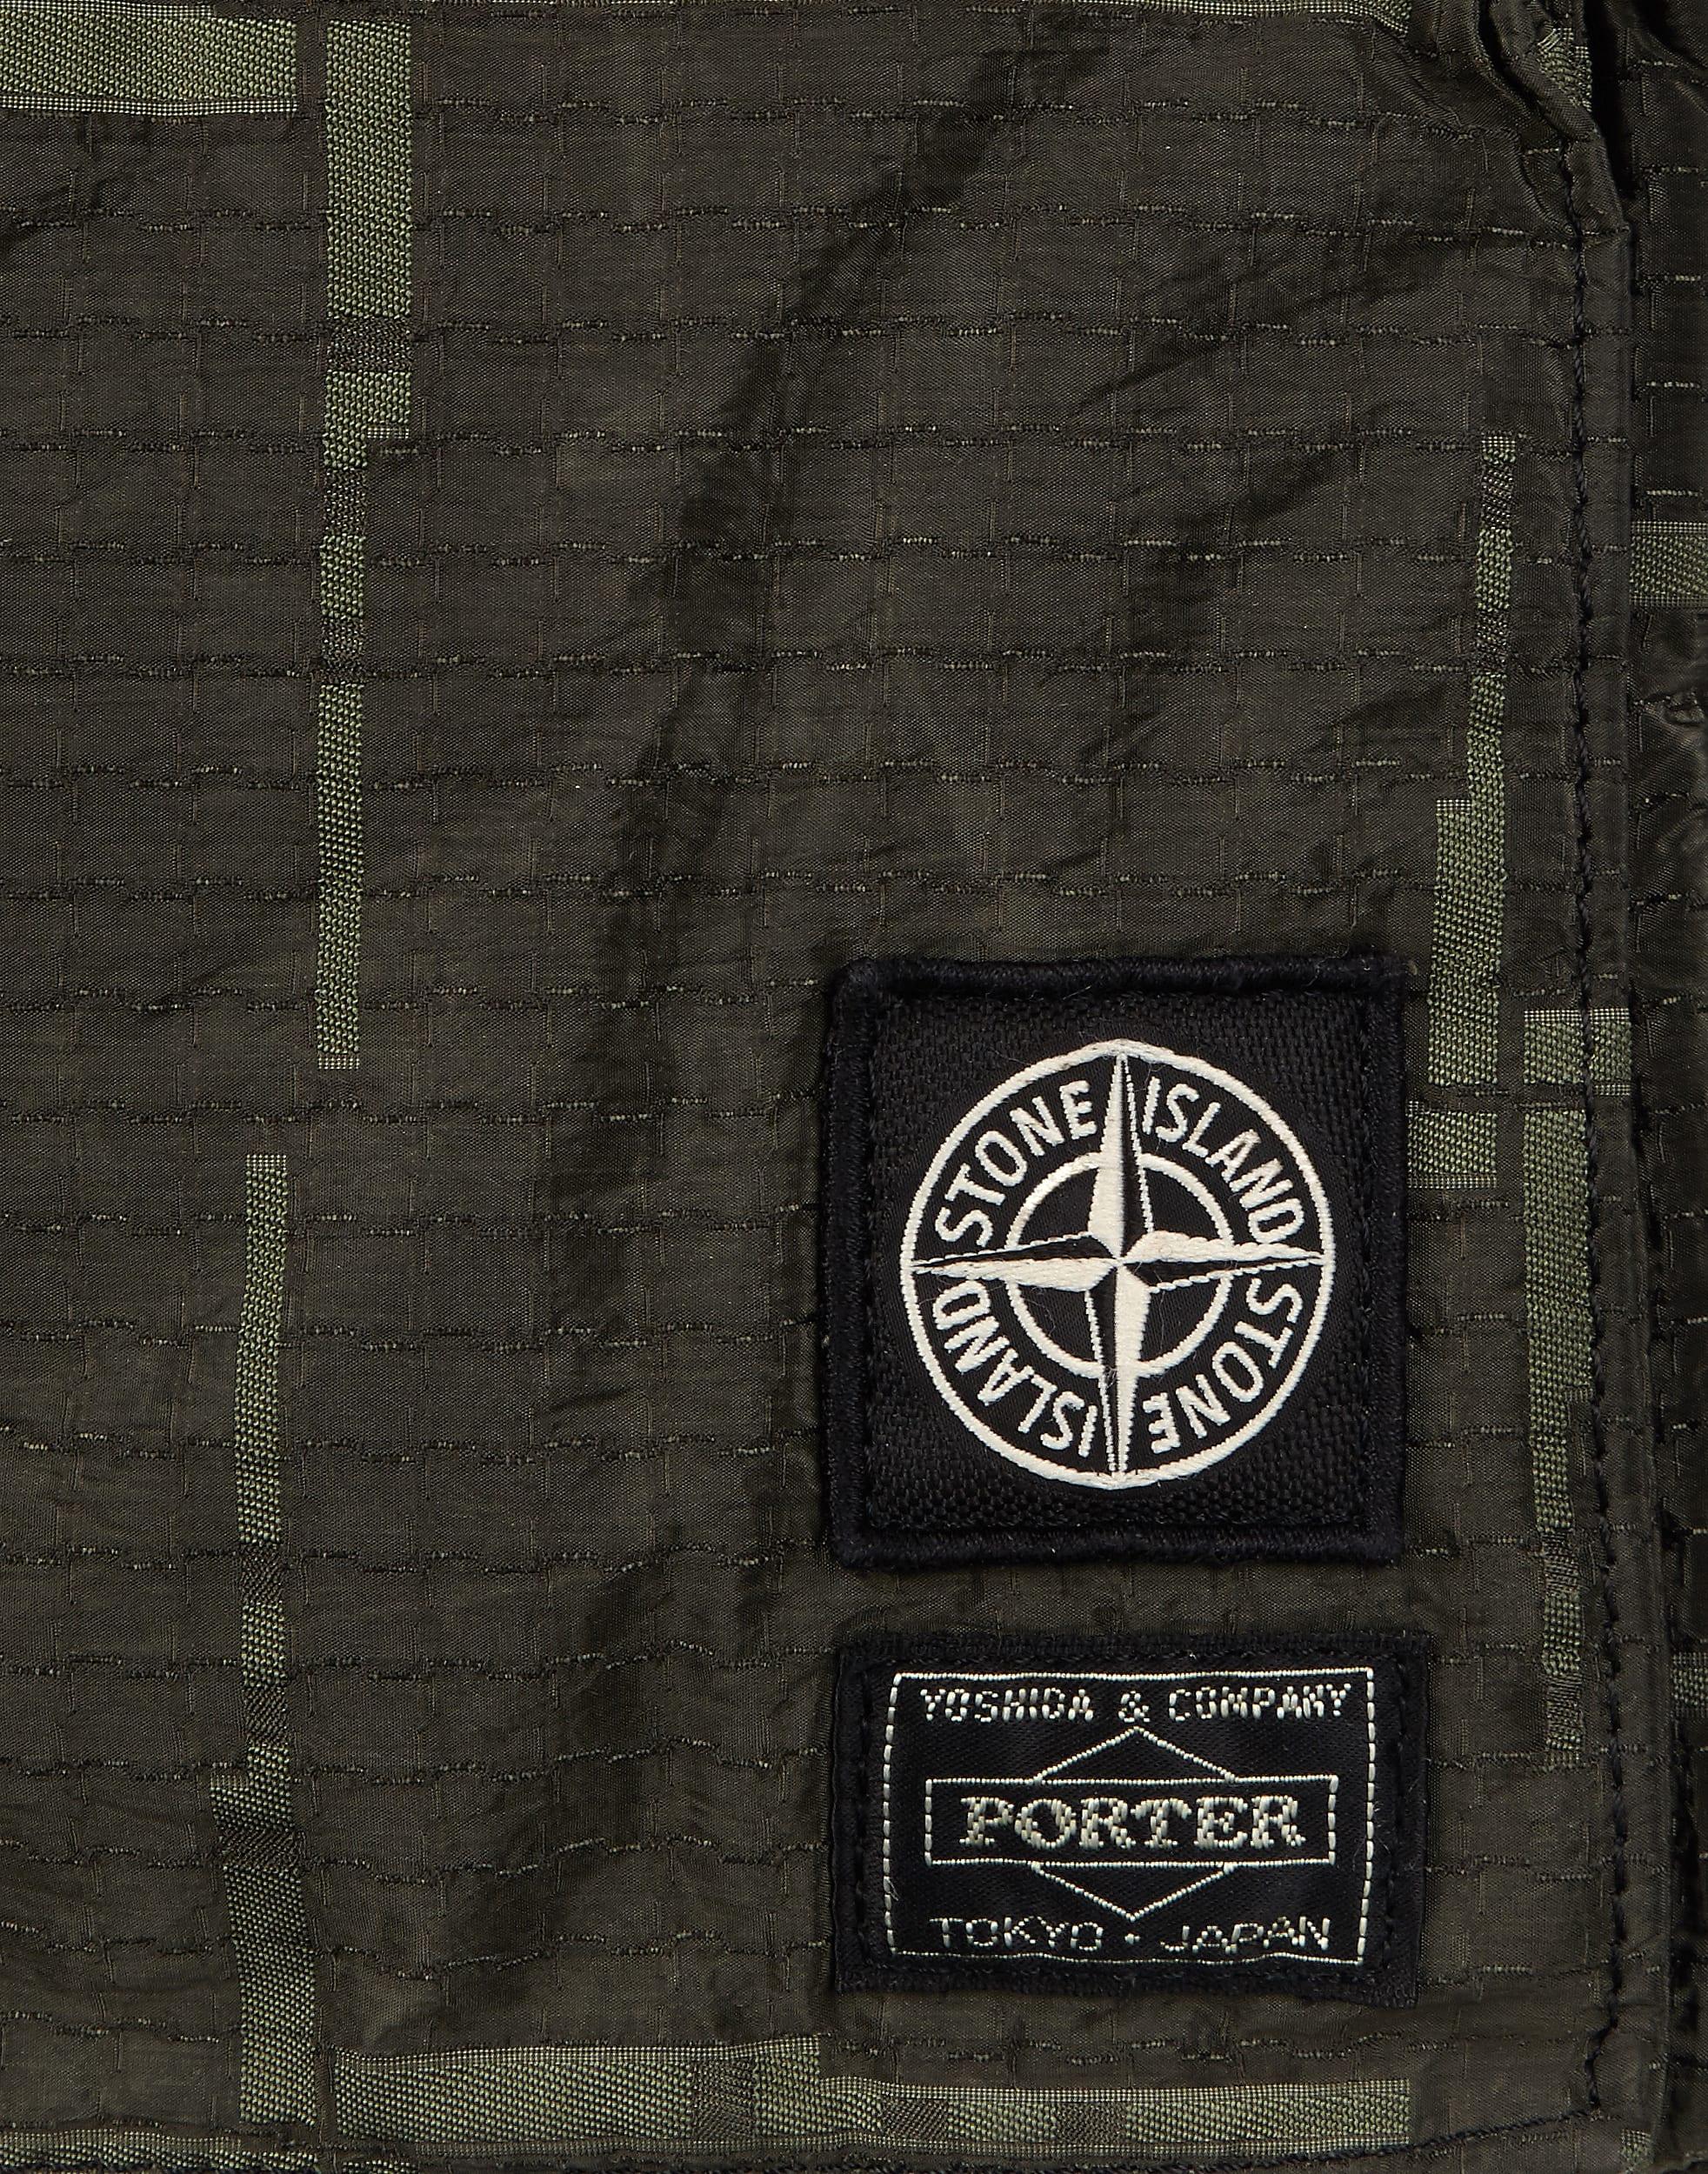 stoneisland-porter3